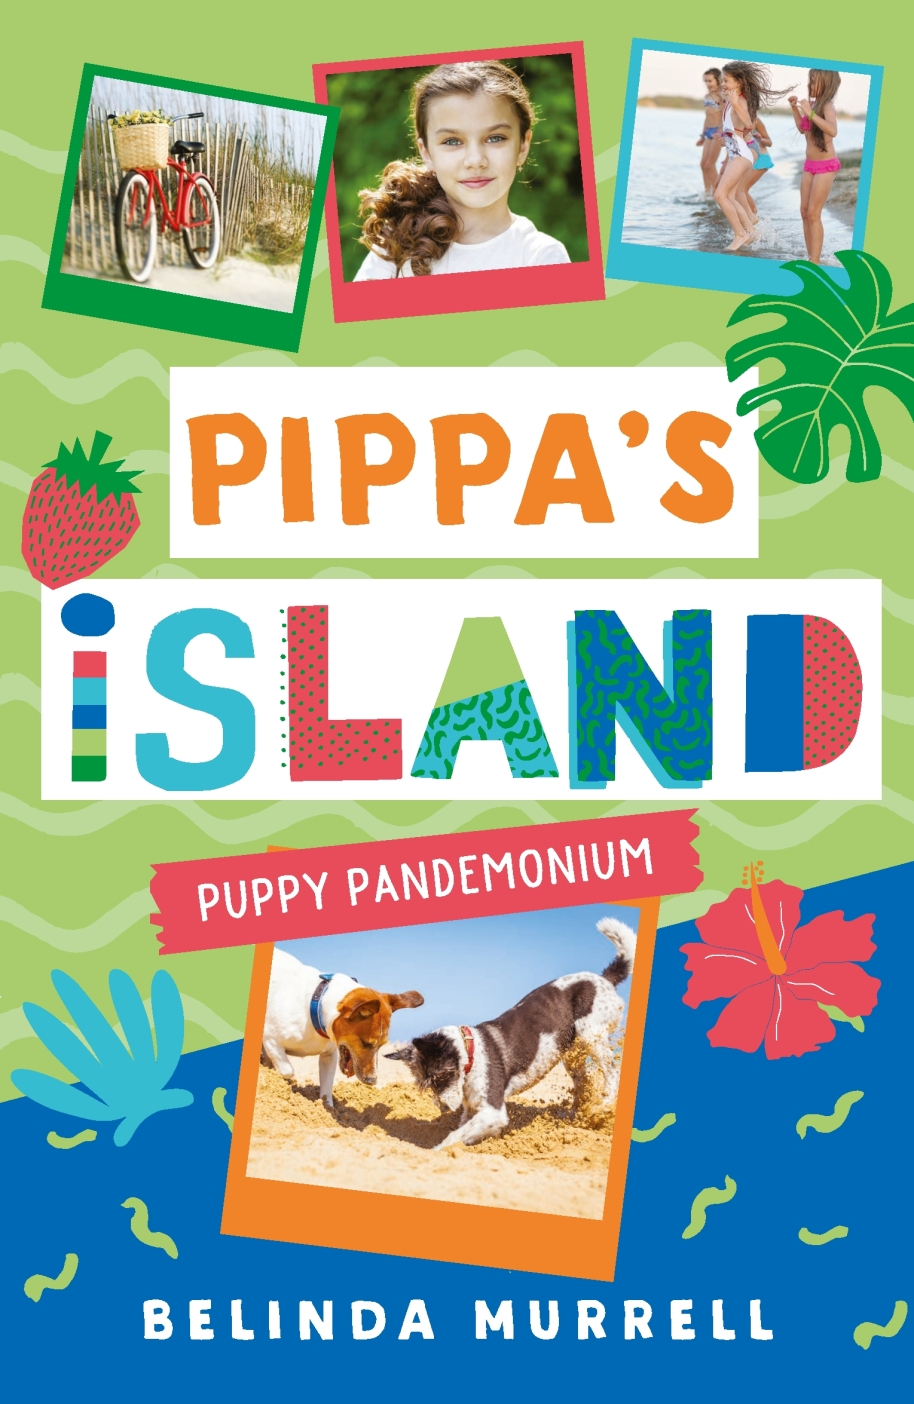 Pippas Island 5.jpg